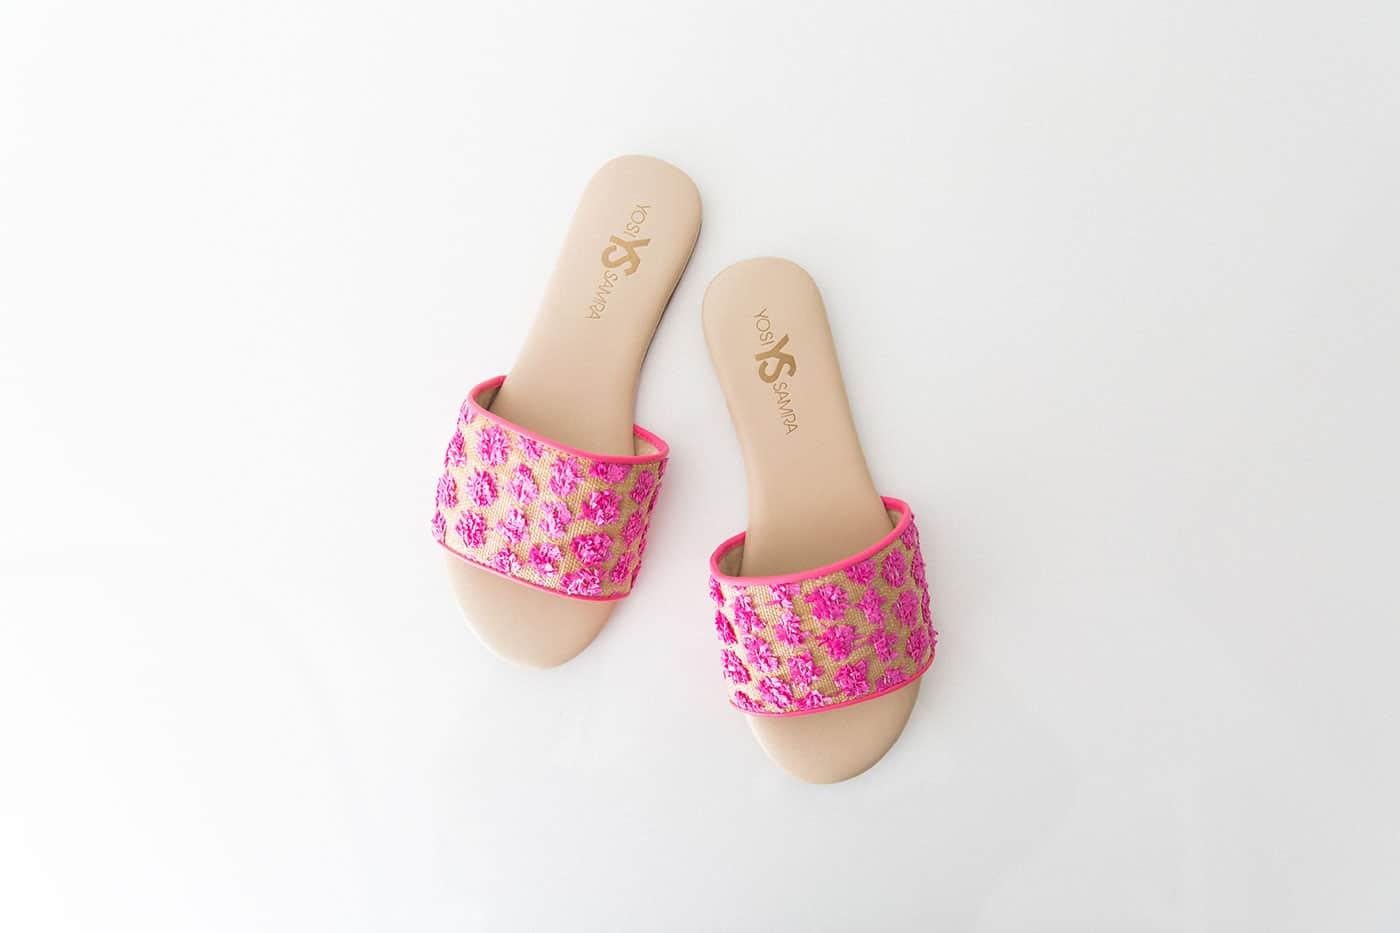 Tiffani Thiessen's Favorite Things June 2016 • Yosi Samra sandals • Photo by Brandon Kidd